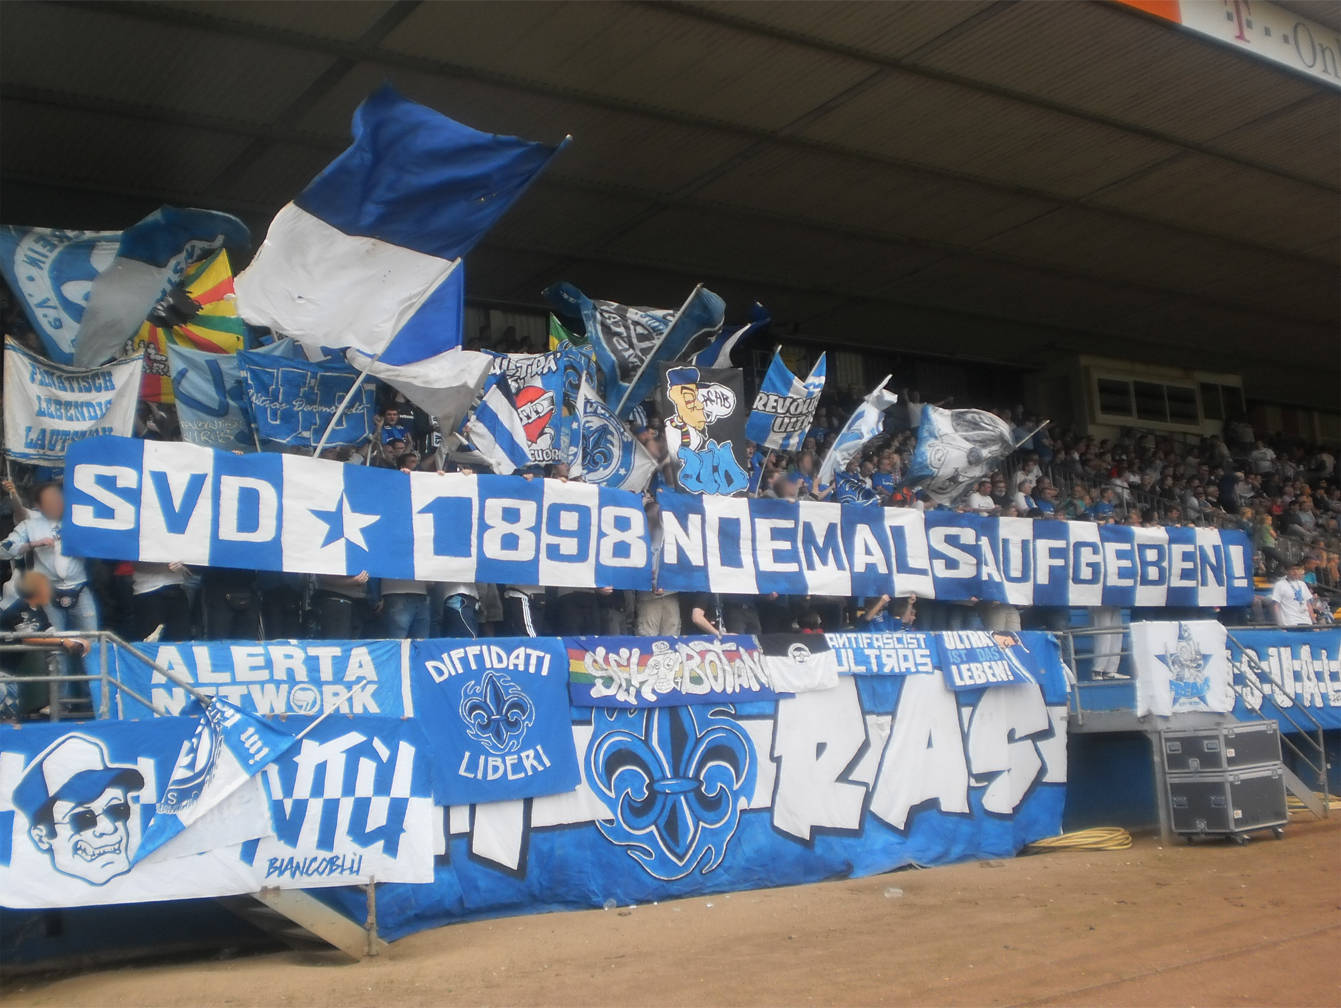 SV Darmstadt Vgejjkmz